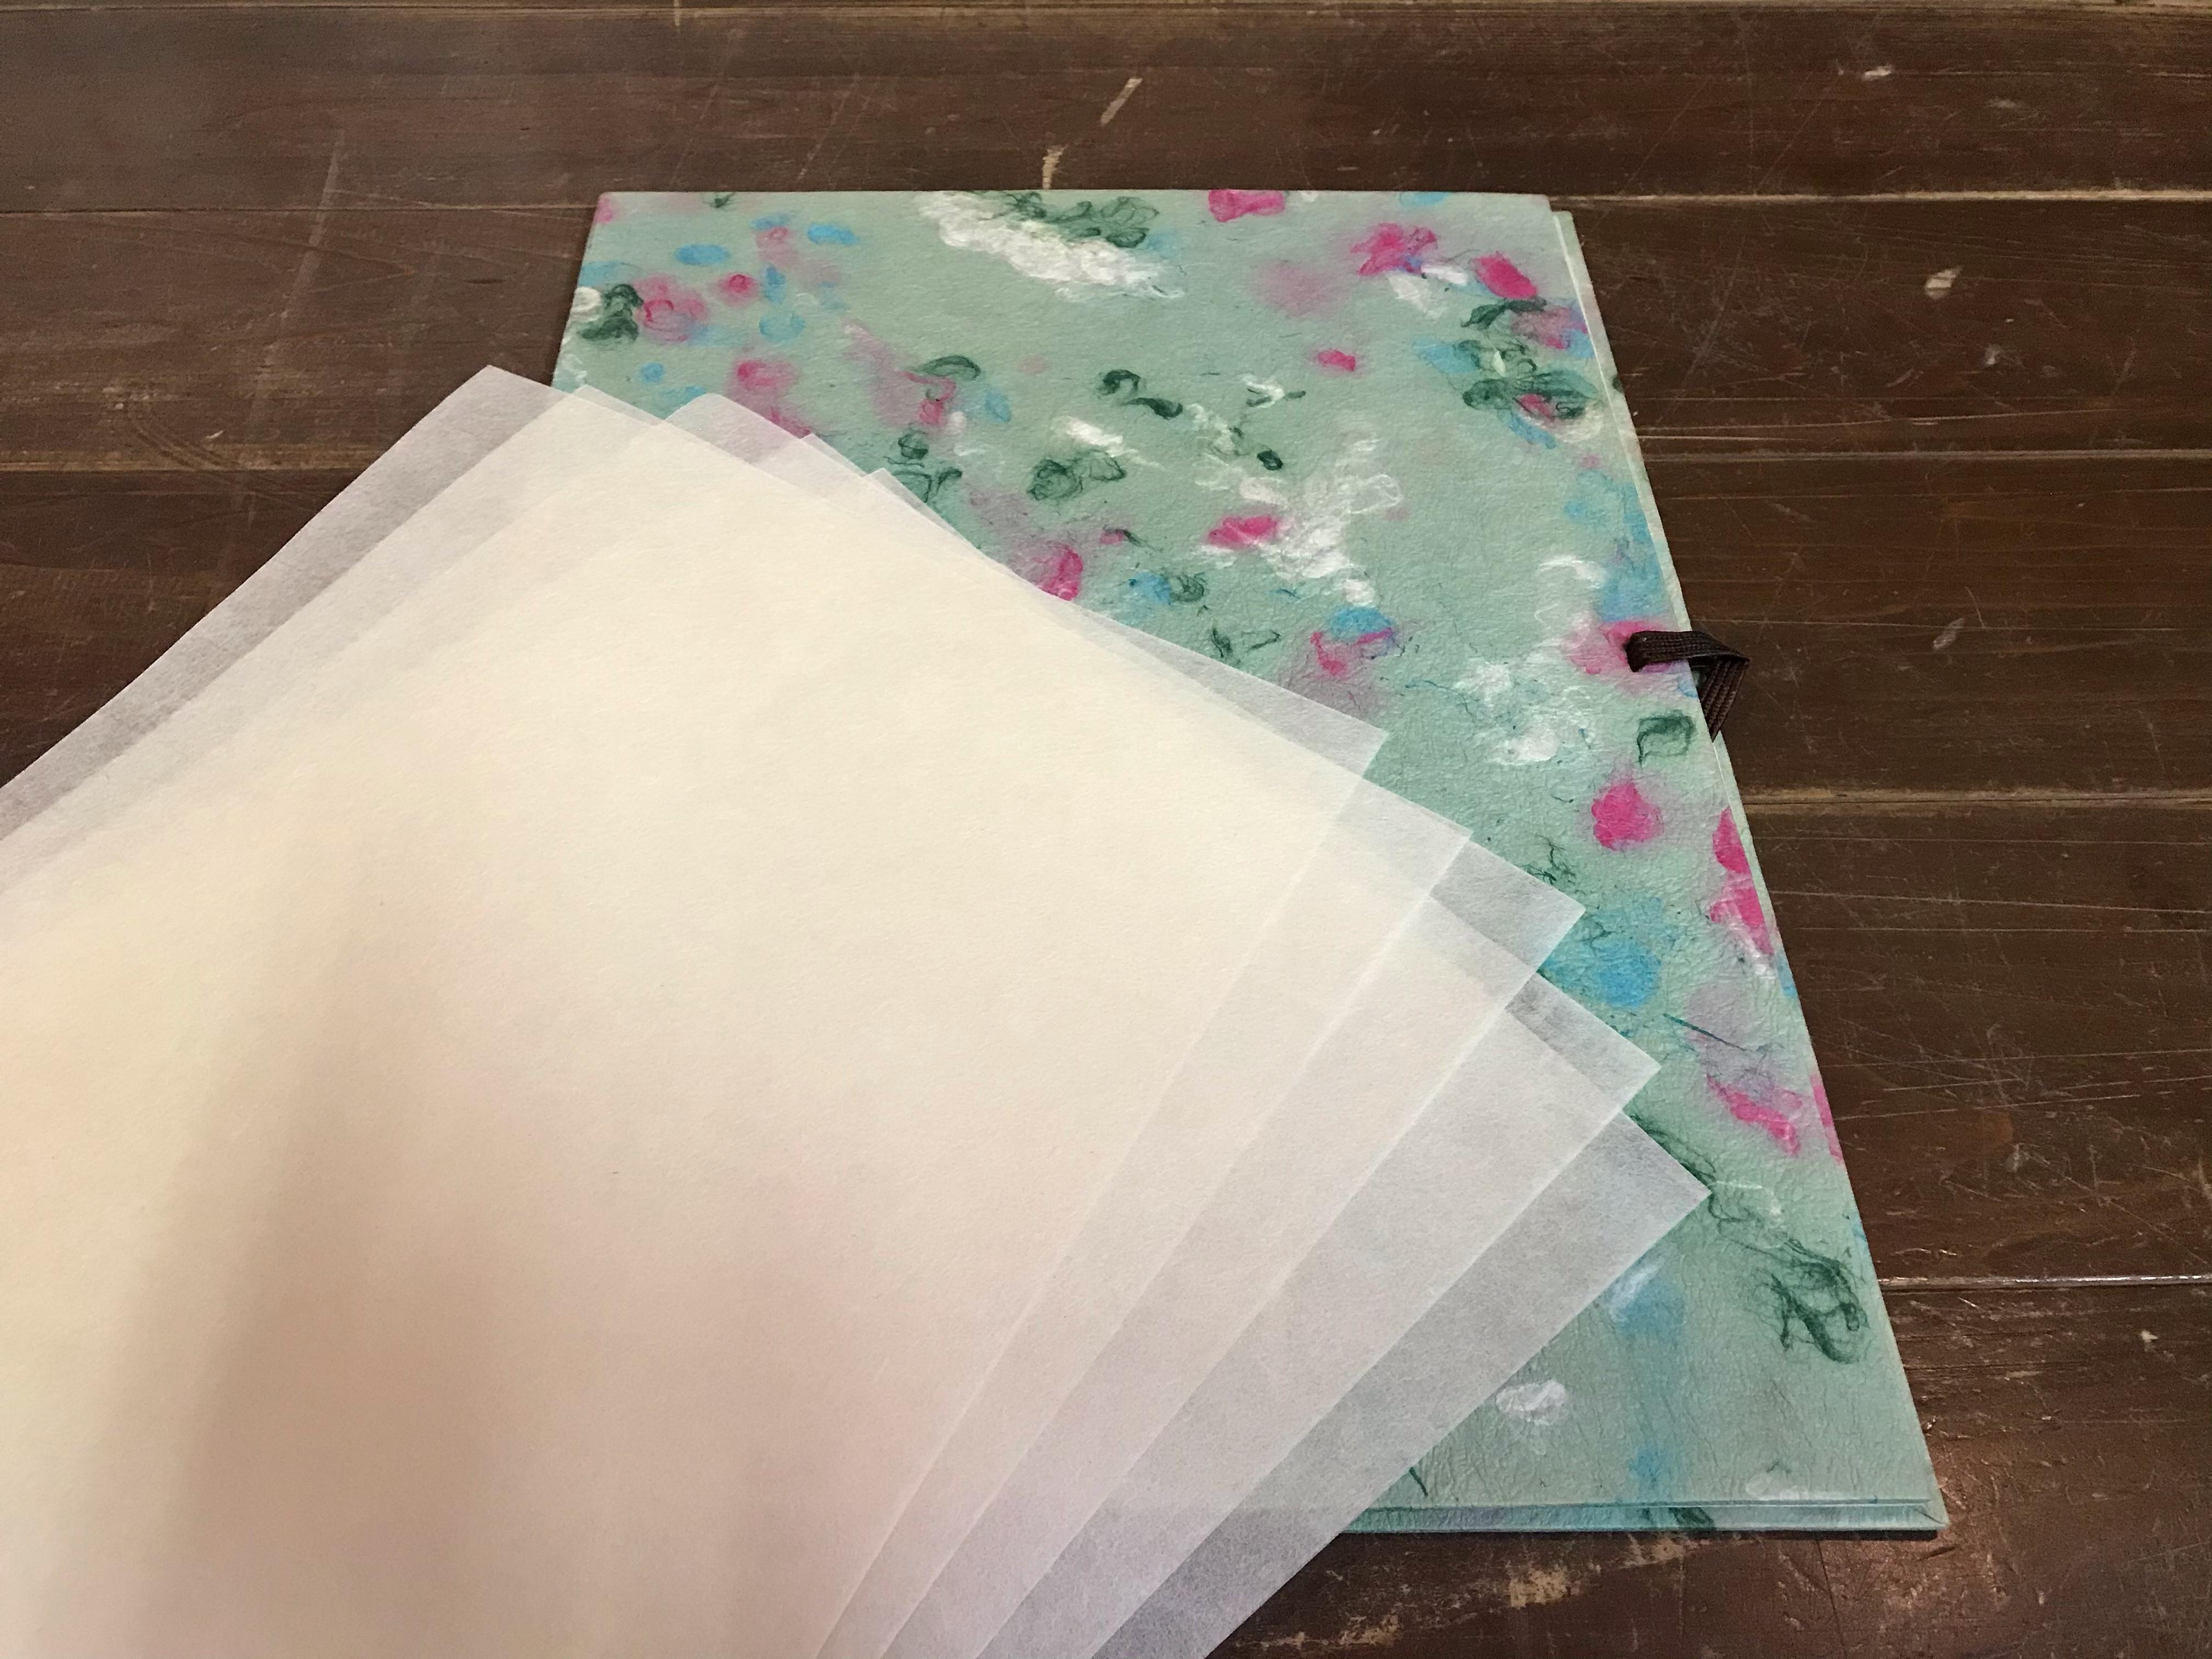 【 BASE 限定品】 京都黒谷和紙   半紙ばさみと高級半紙セット